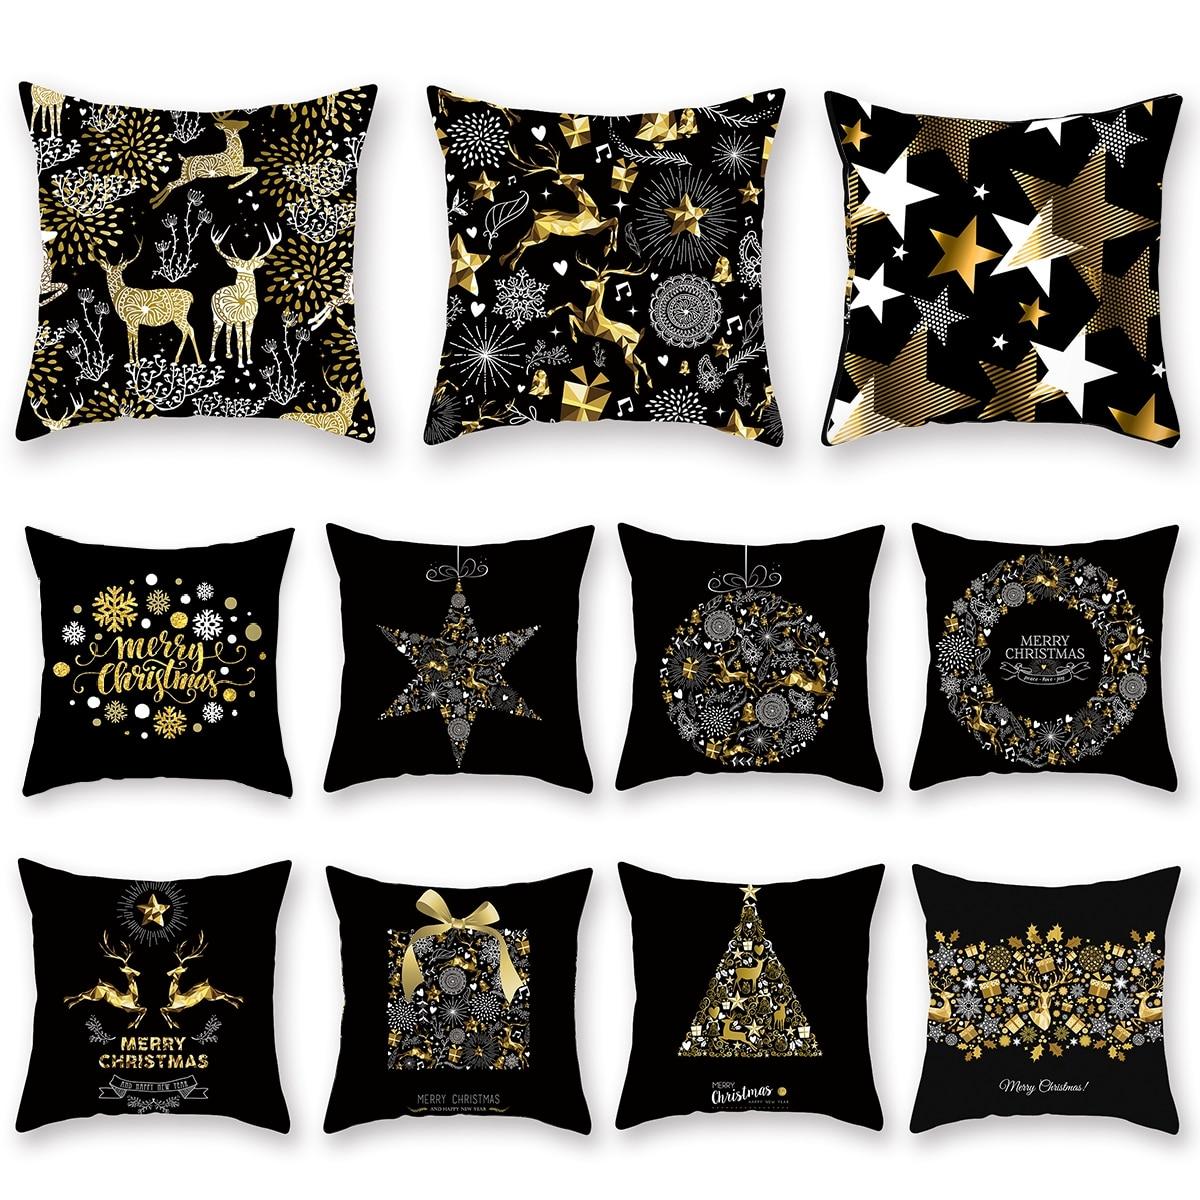 H435d7eb8be774c73b52e8b480ad6f50b5 Christmas Pillow Coussin Cartoon Geometric Cushions Case Christmas Home Decorative Cushion For Sofa Xmas DIY Soft hug Pillowcase